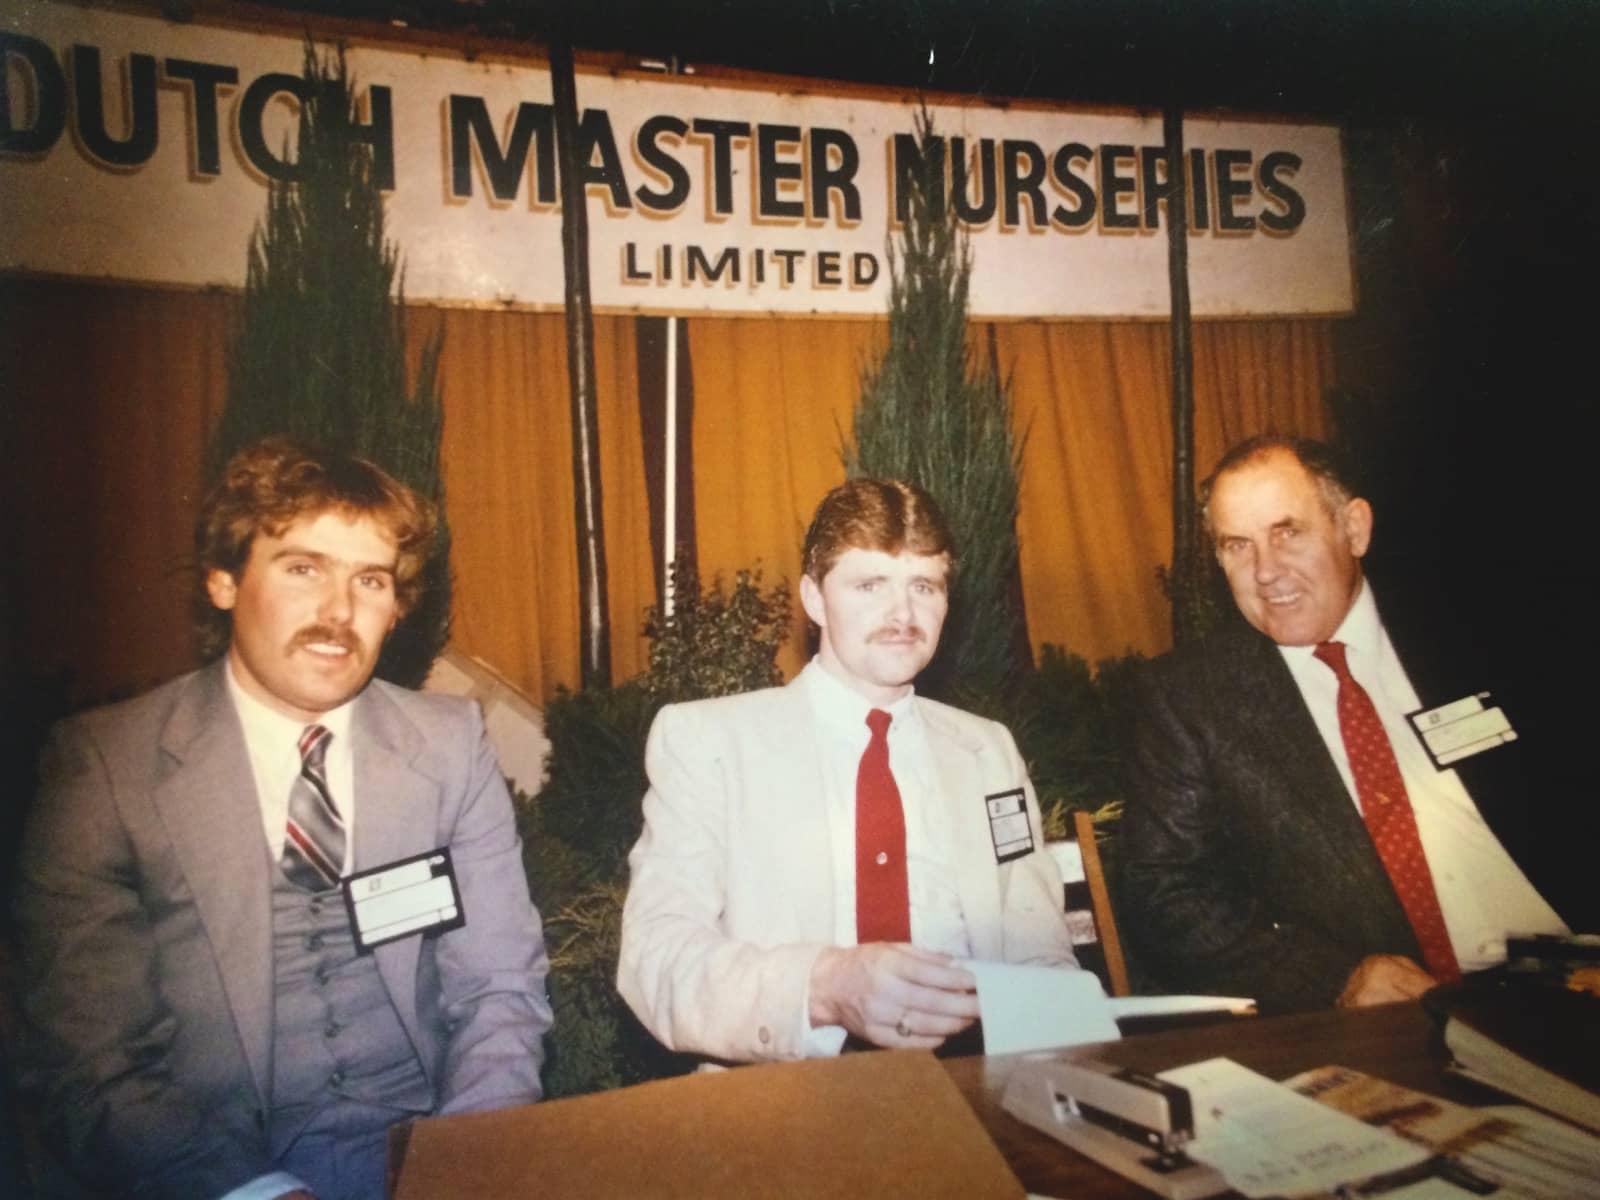 Old Photo - Dutchmaster